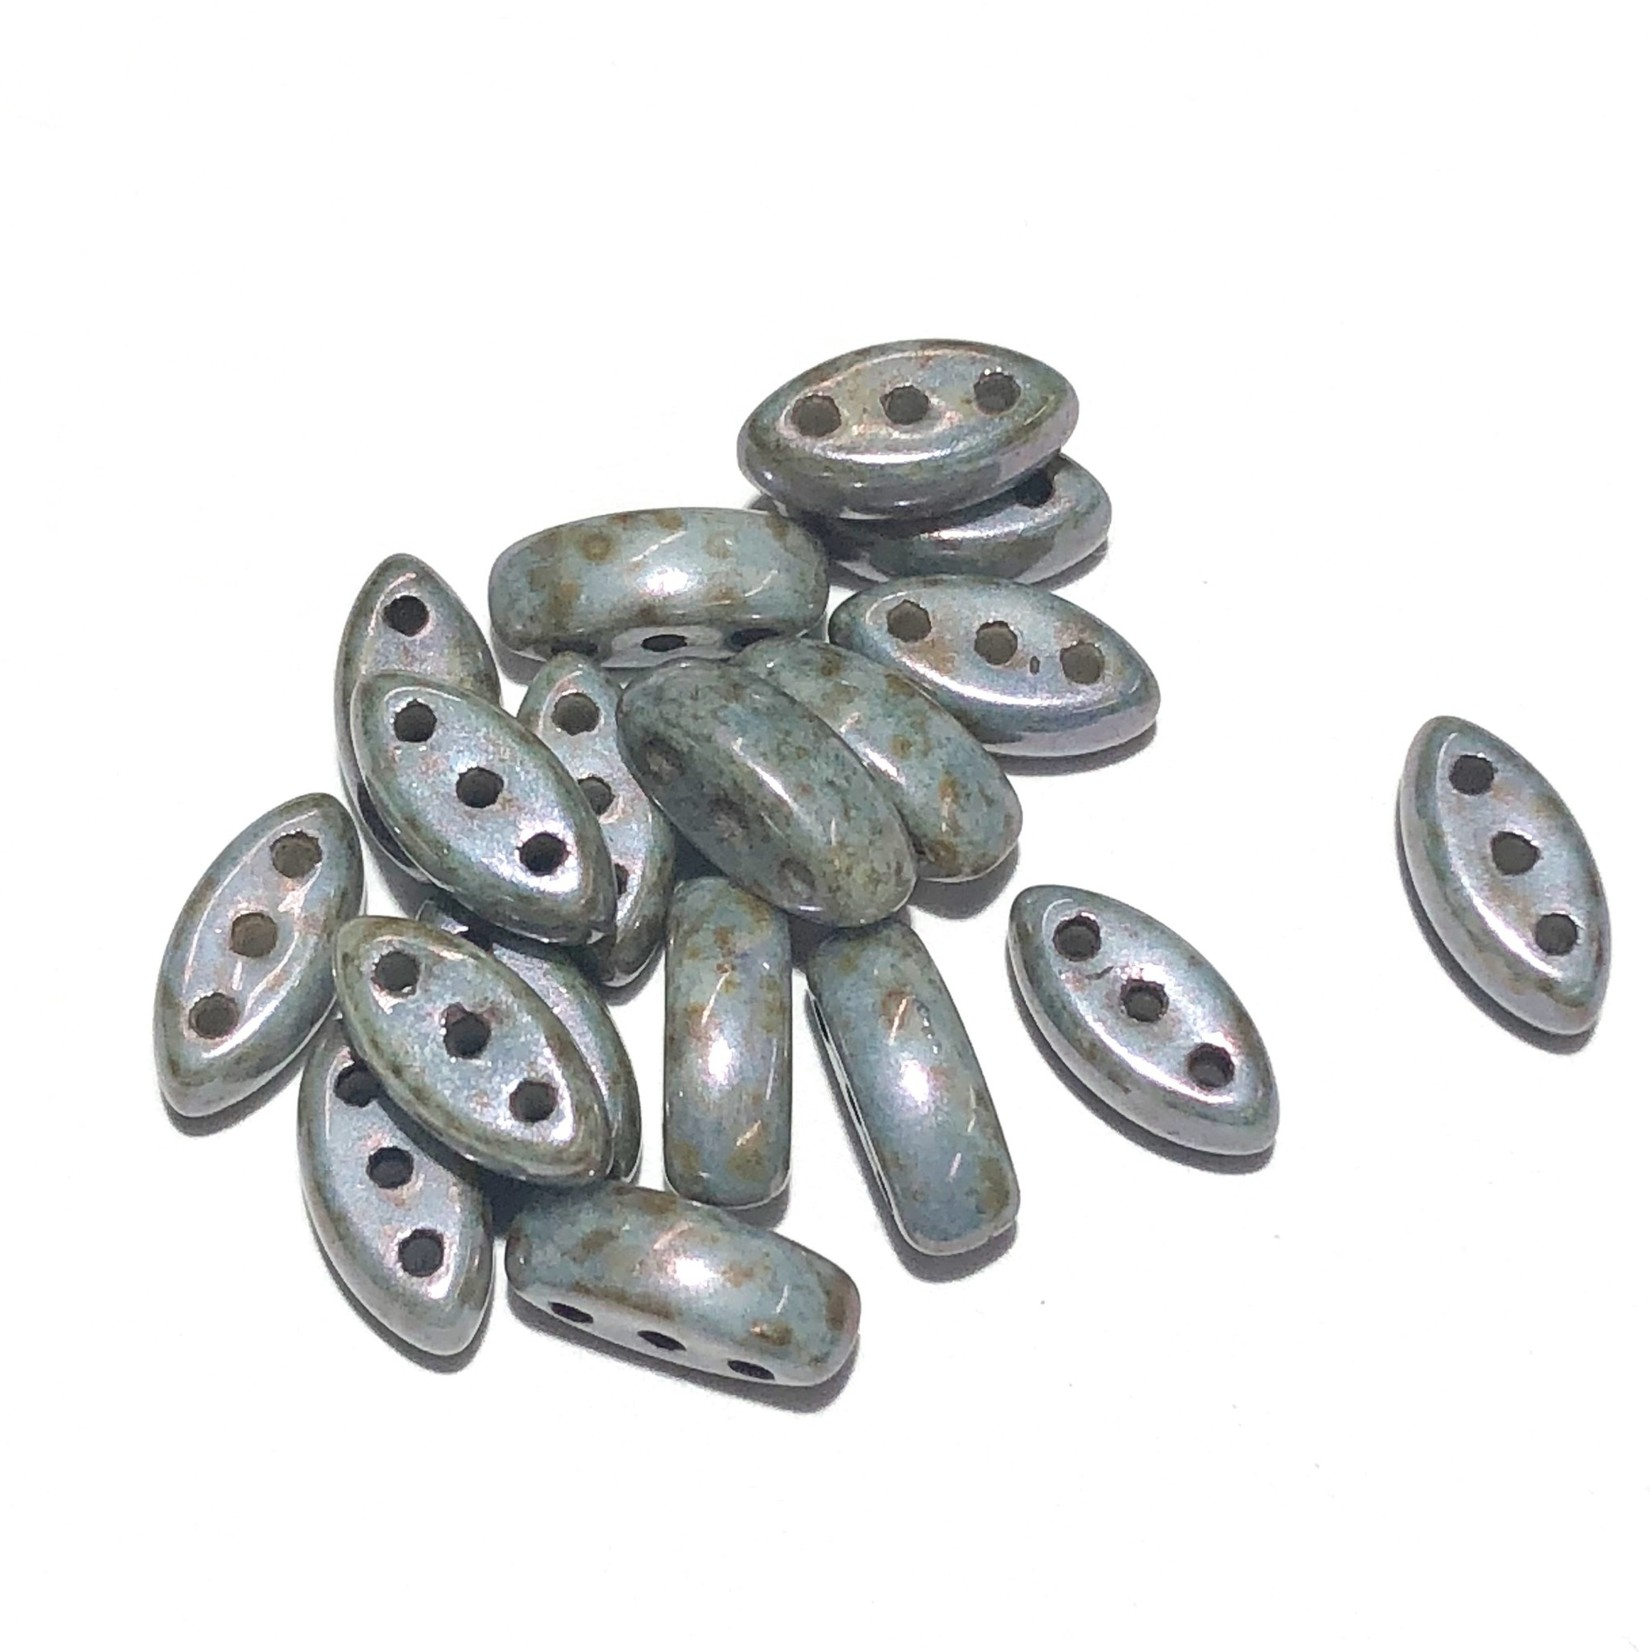 Cali Beads 3-Hole Chalk White/Blue Satin 40pcs